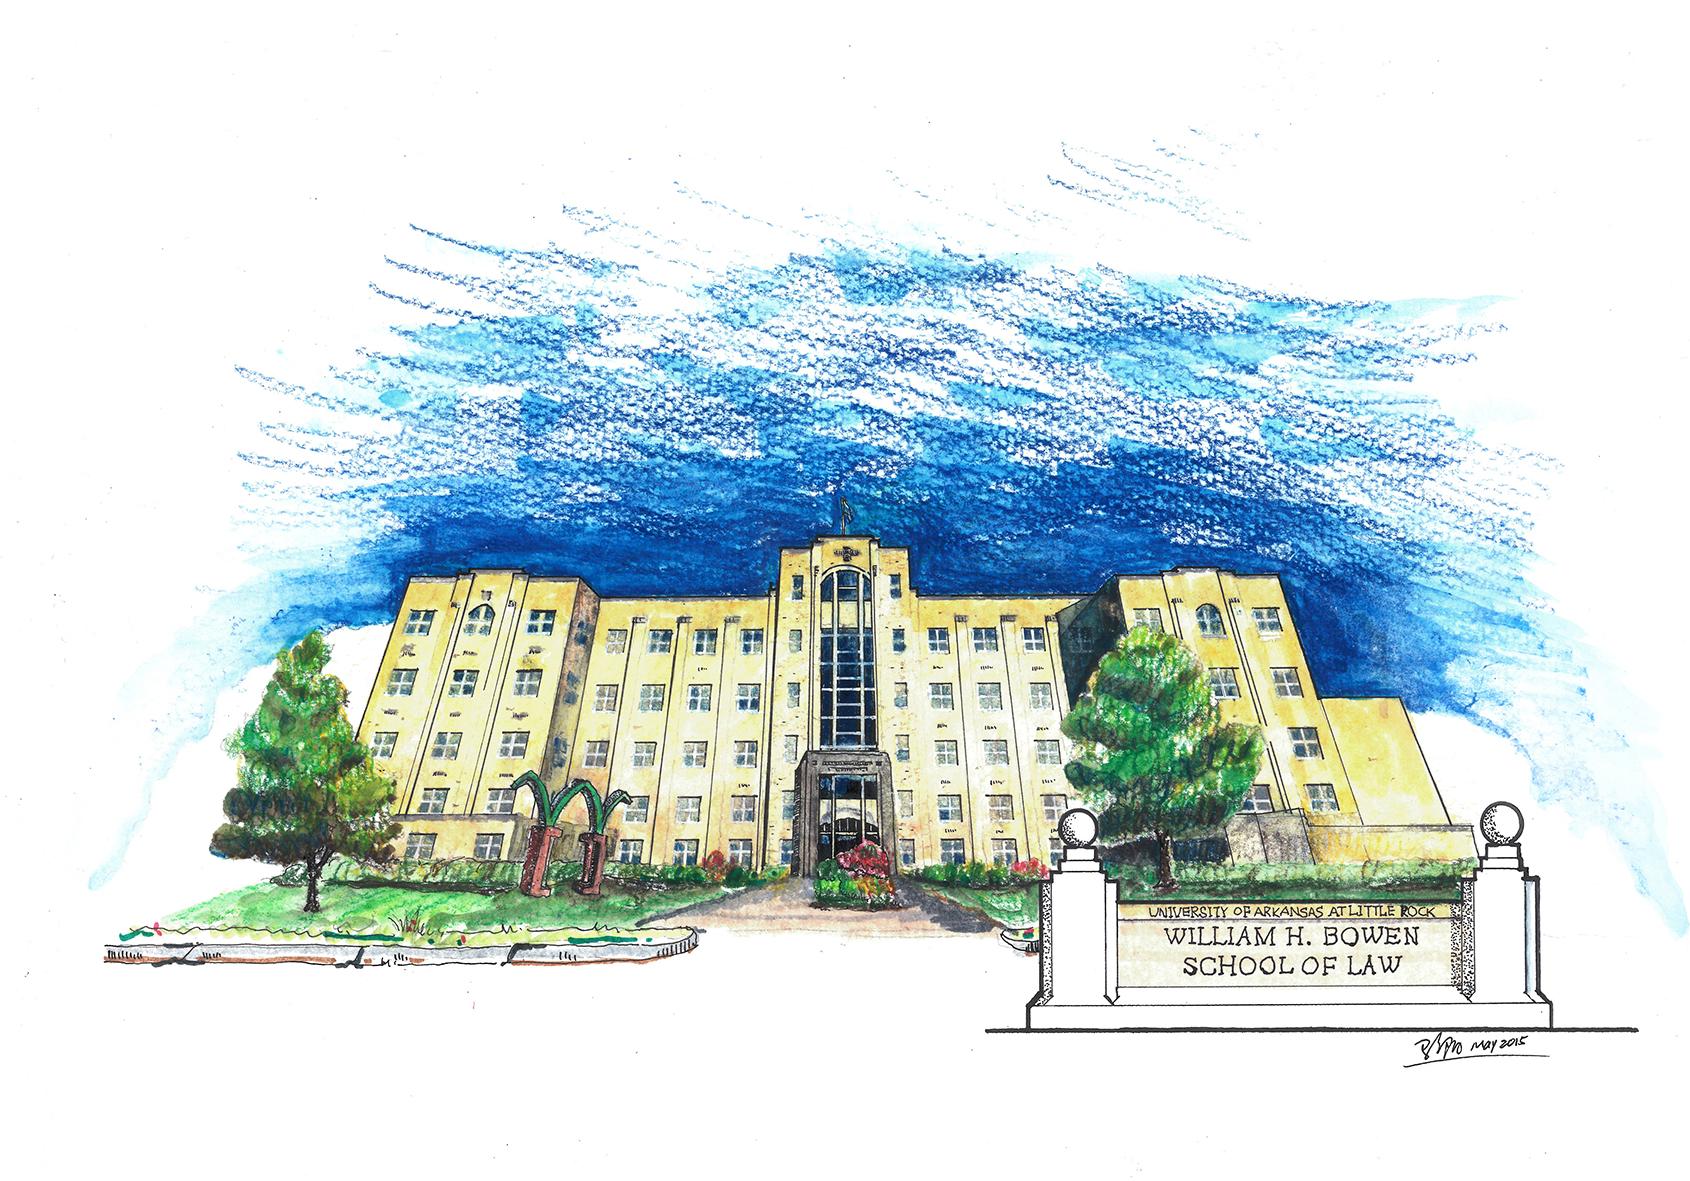 William H. Bowen School of Law at University of Arkansas at Little Rock